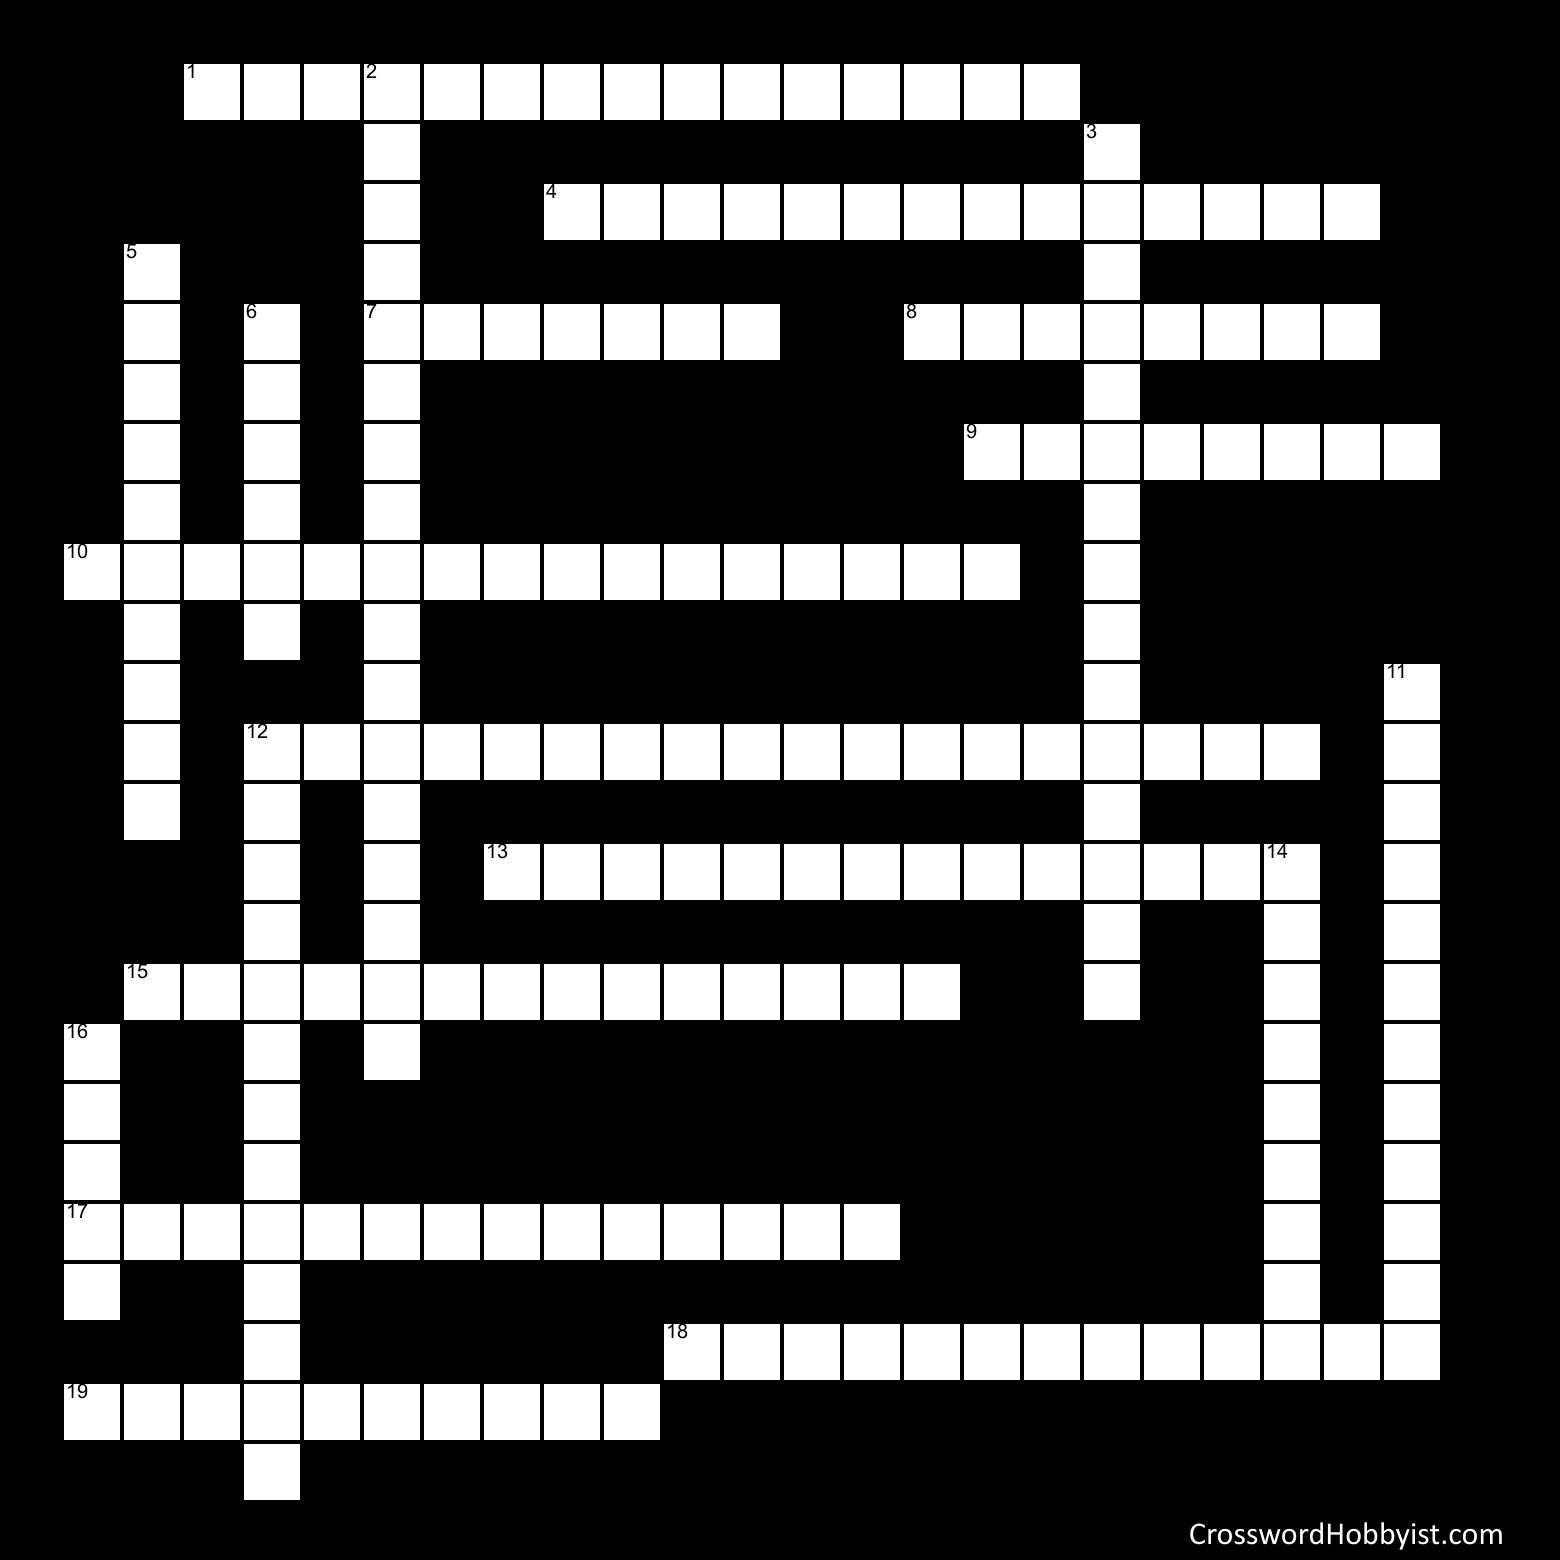 WWI Crossword Puzzle - Layla - Crossword Puzzle